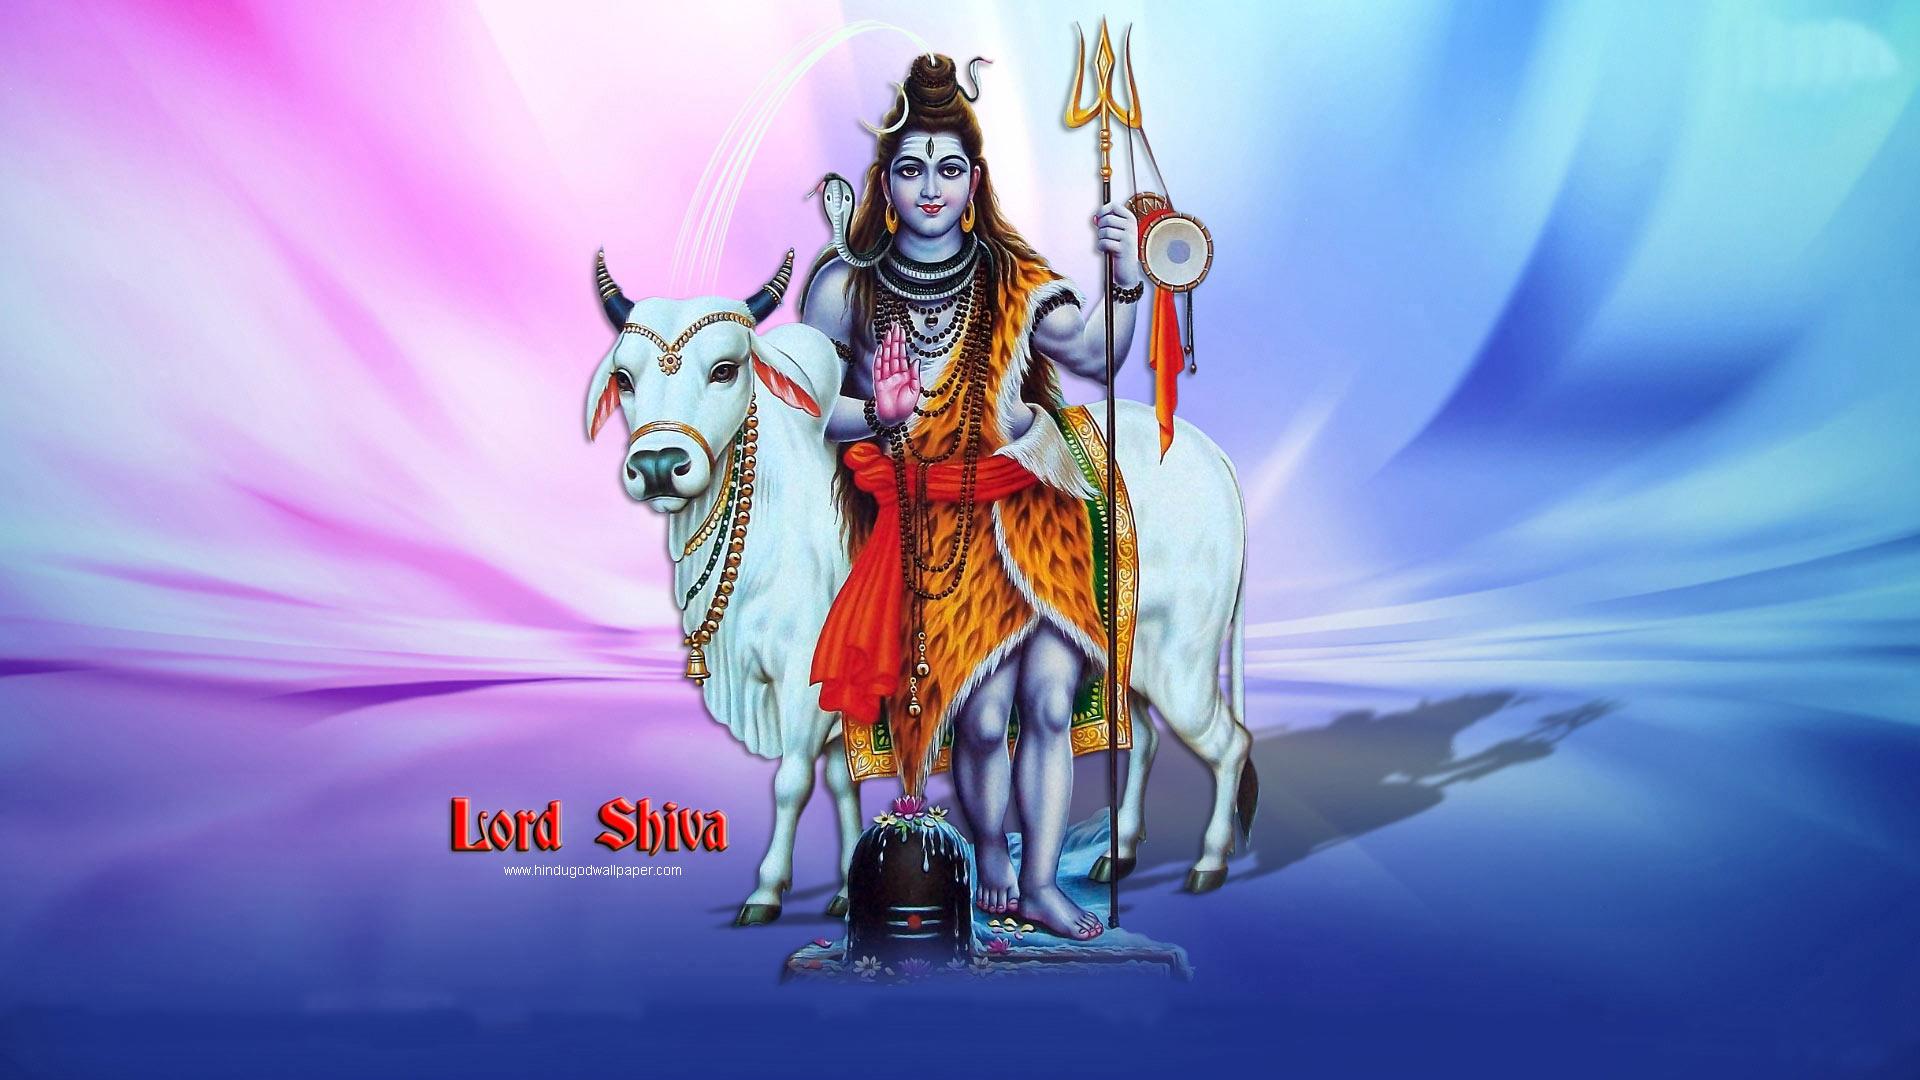 Lord Shiva Wallpapers HD - WallpaperSafari